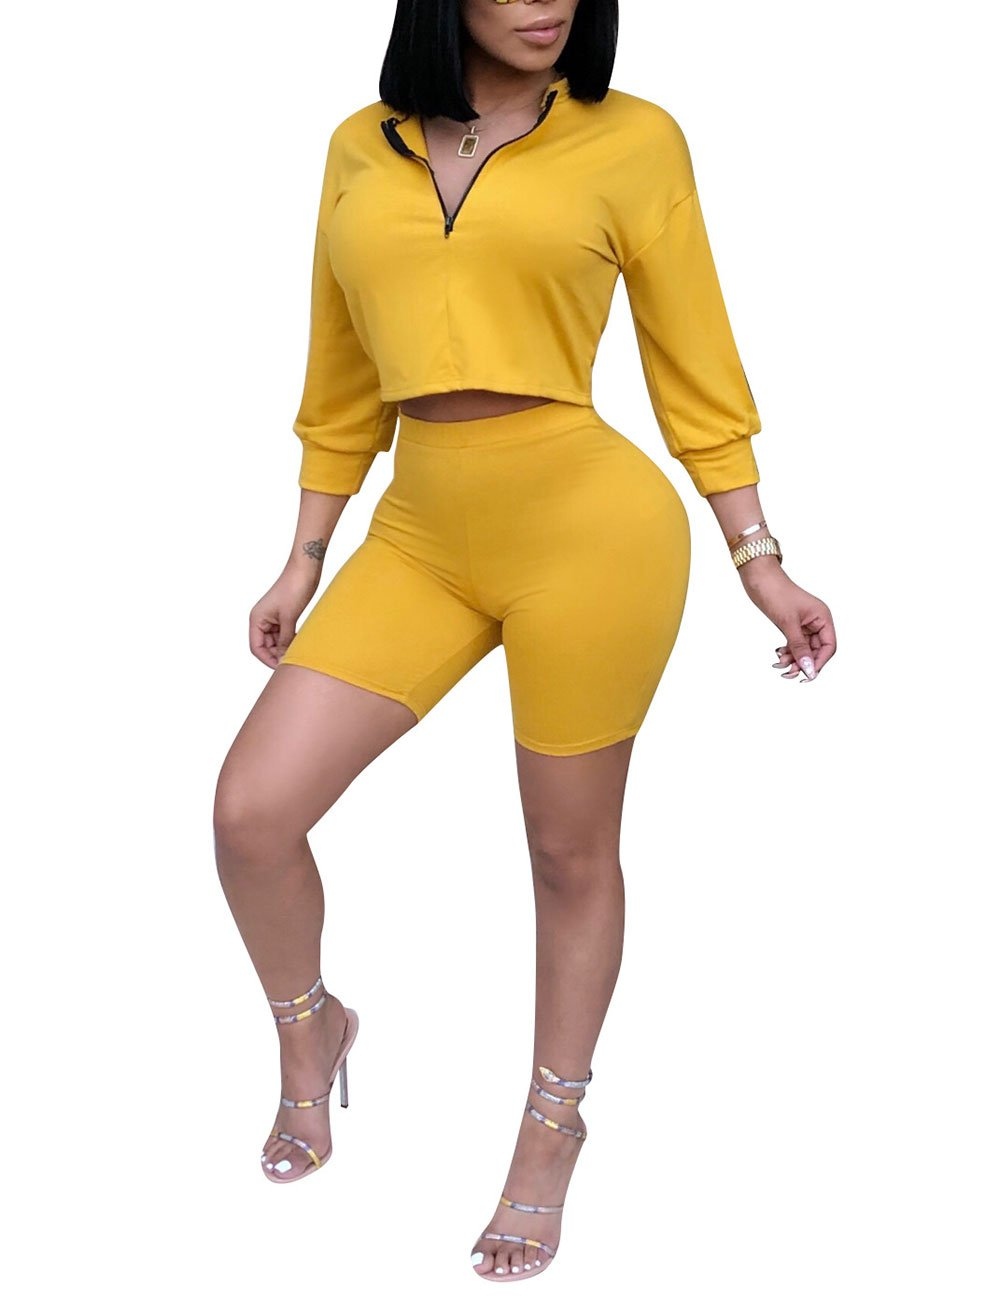 Womens Zipper Front Crop Tops High Waist Bodycon Shorts Set 2 Piece Jogging Outfits Yellow M